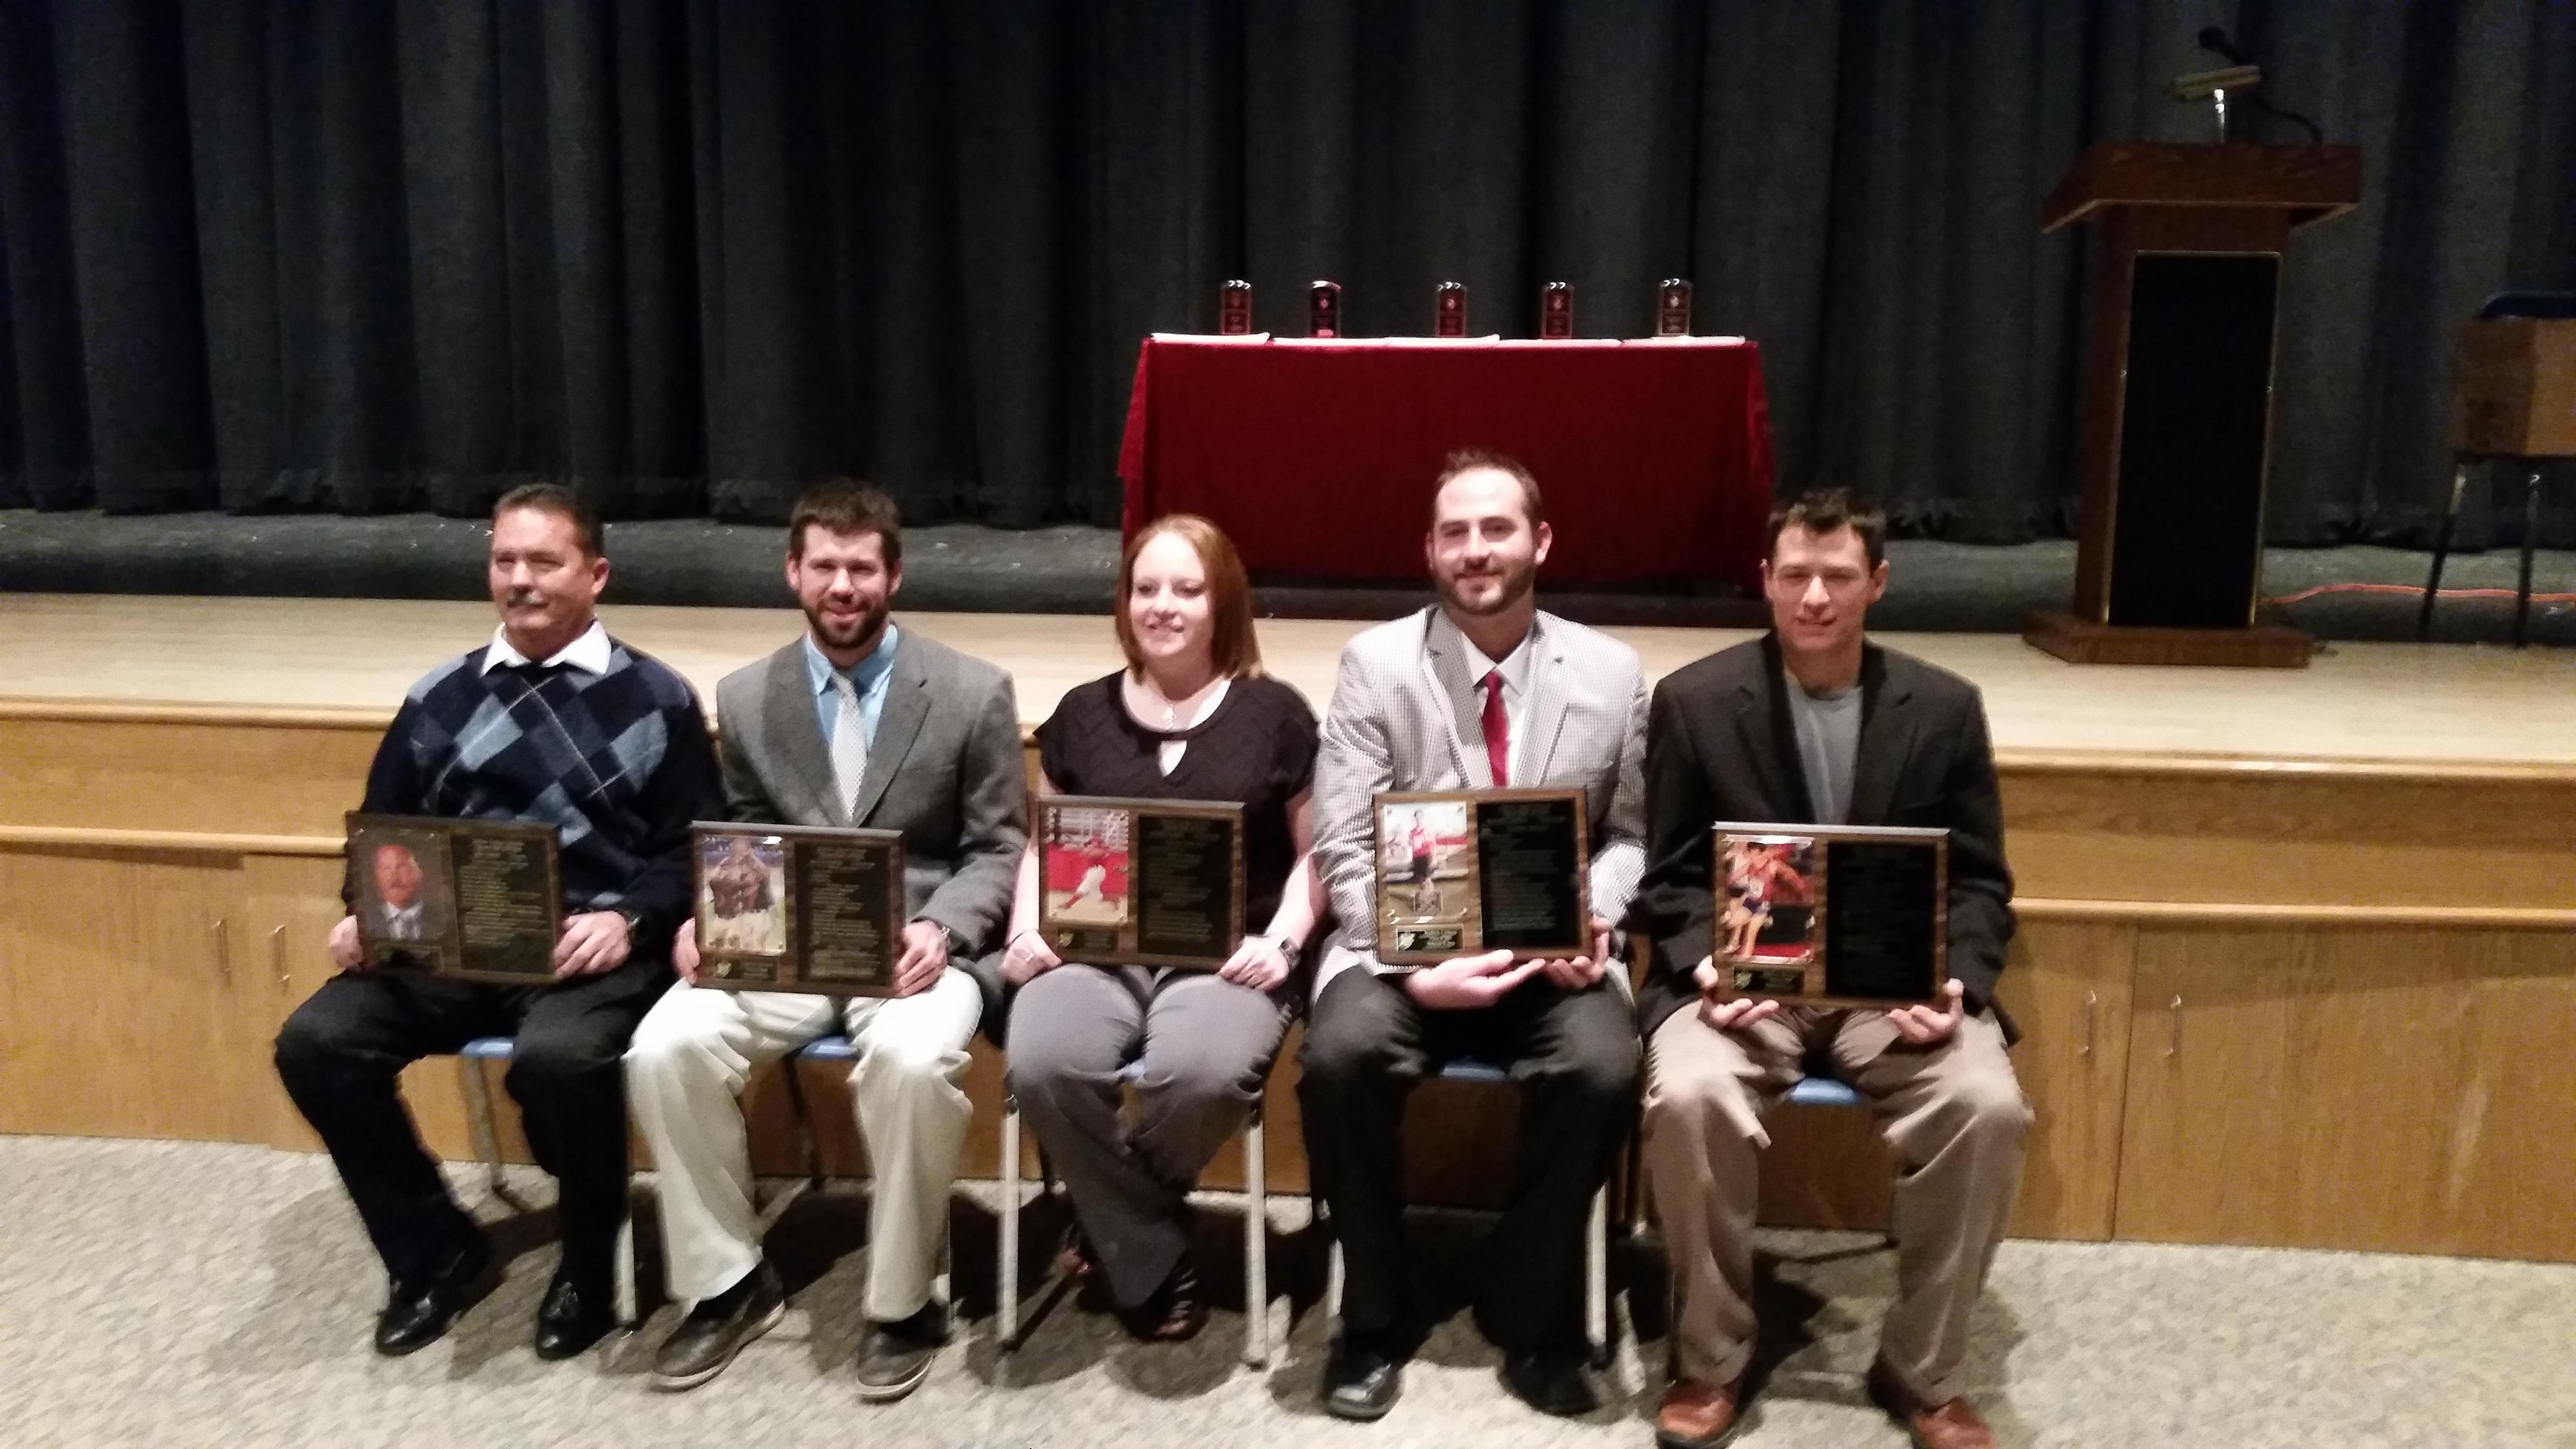 Inducted into the Hilton CSD 2014 Athletic Hall of Fame are: (l-r) John Feeney, gymnastics coach; Jonathan Schwind, 2008; Rachel Clonick, 2006; Matthew Cushman, 2001; and Matthew Blodgett, 1995.